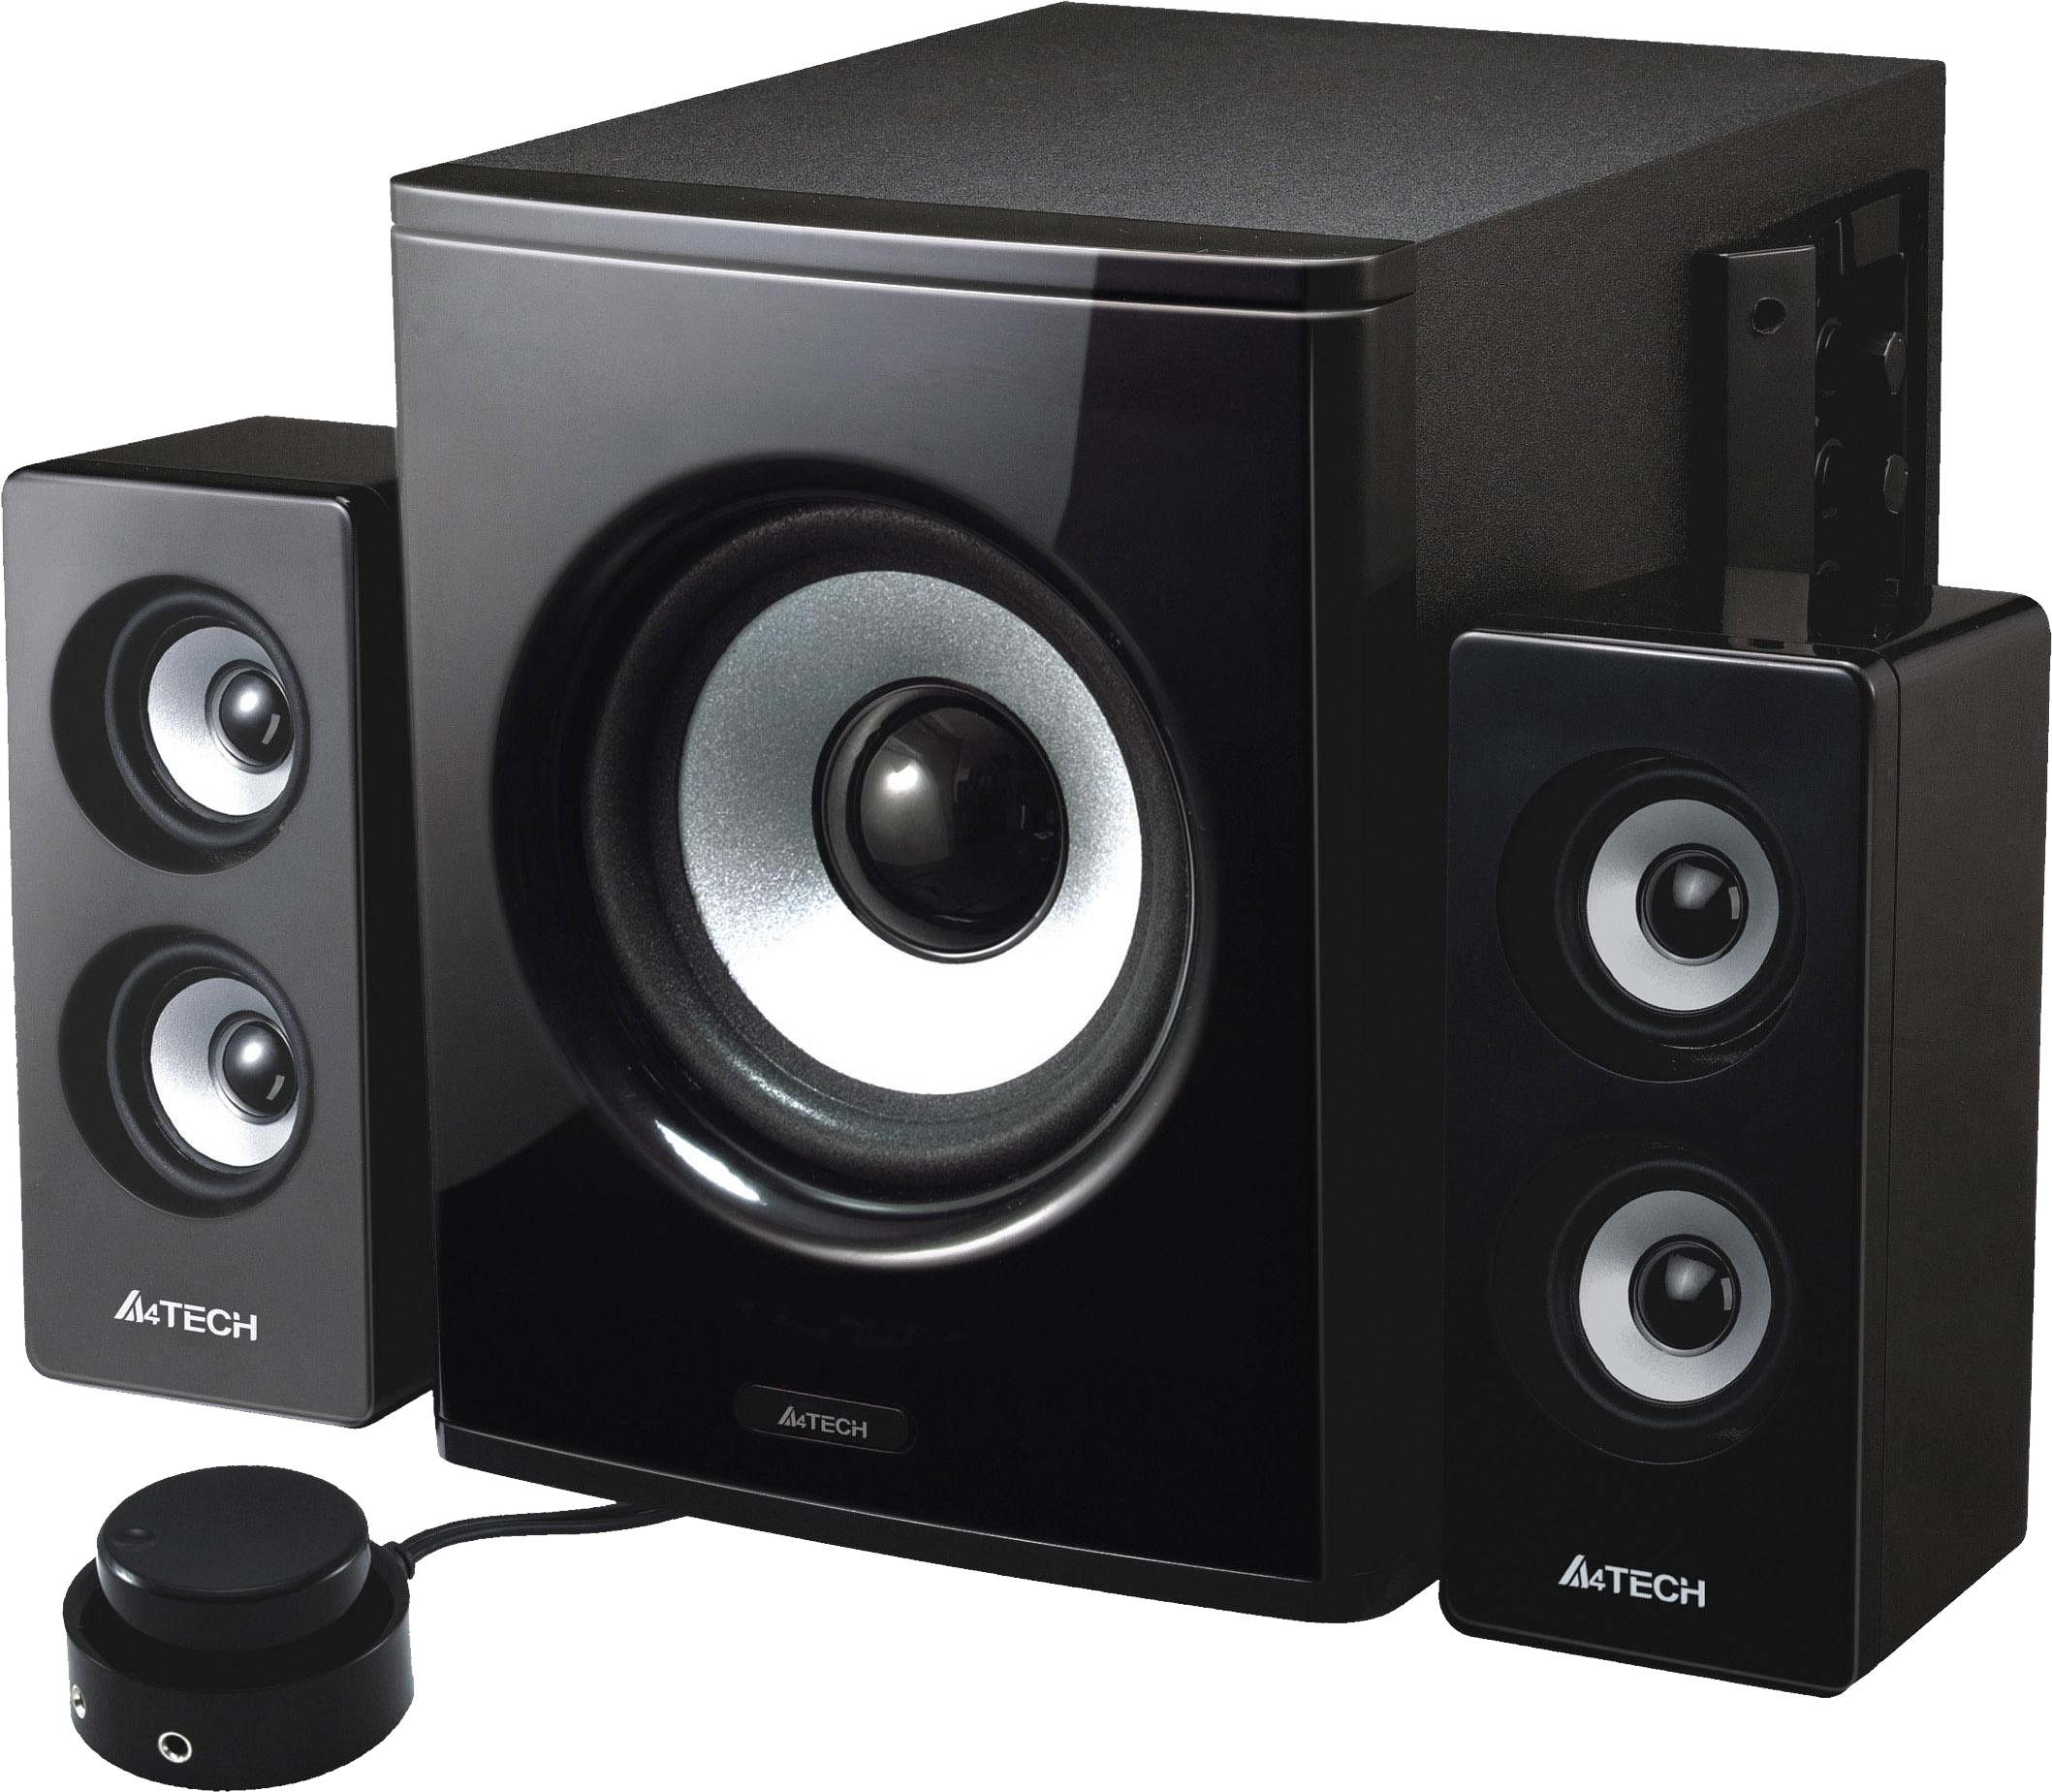 Yamaha Computer Speakers